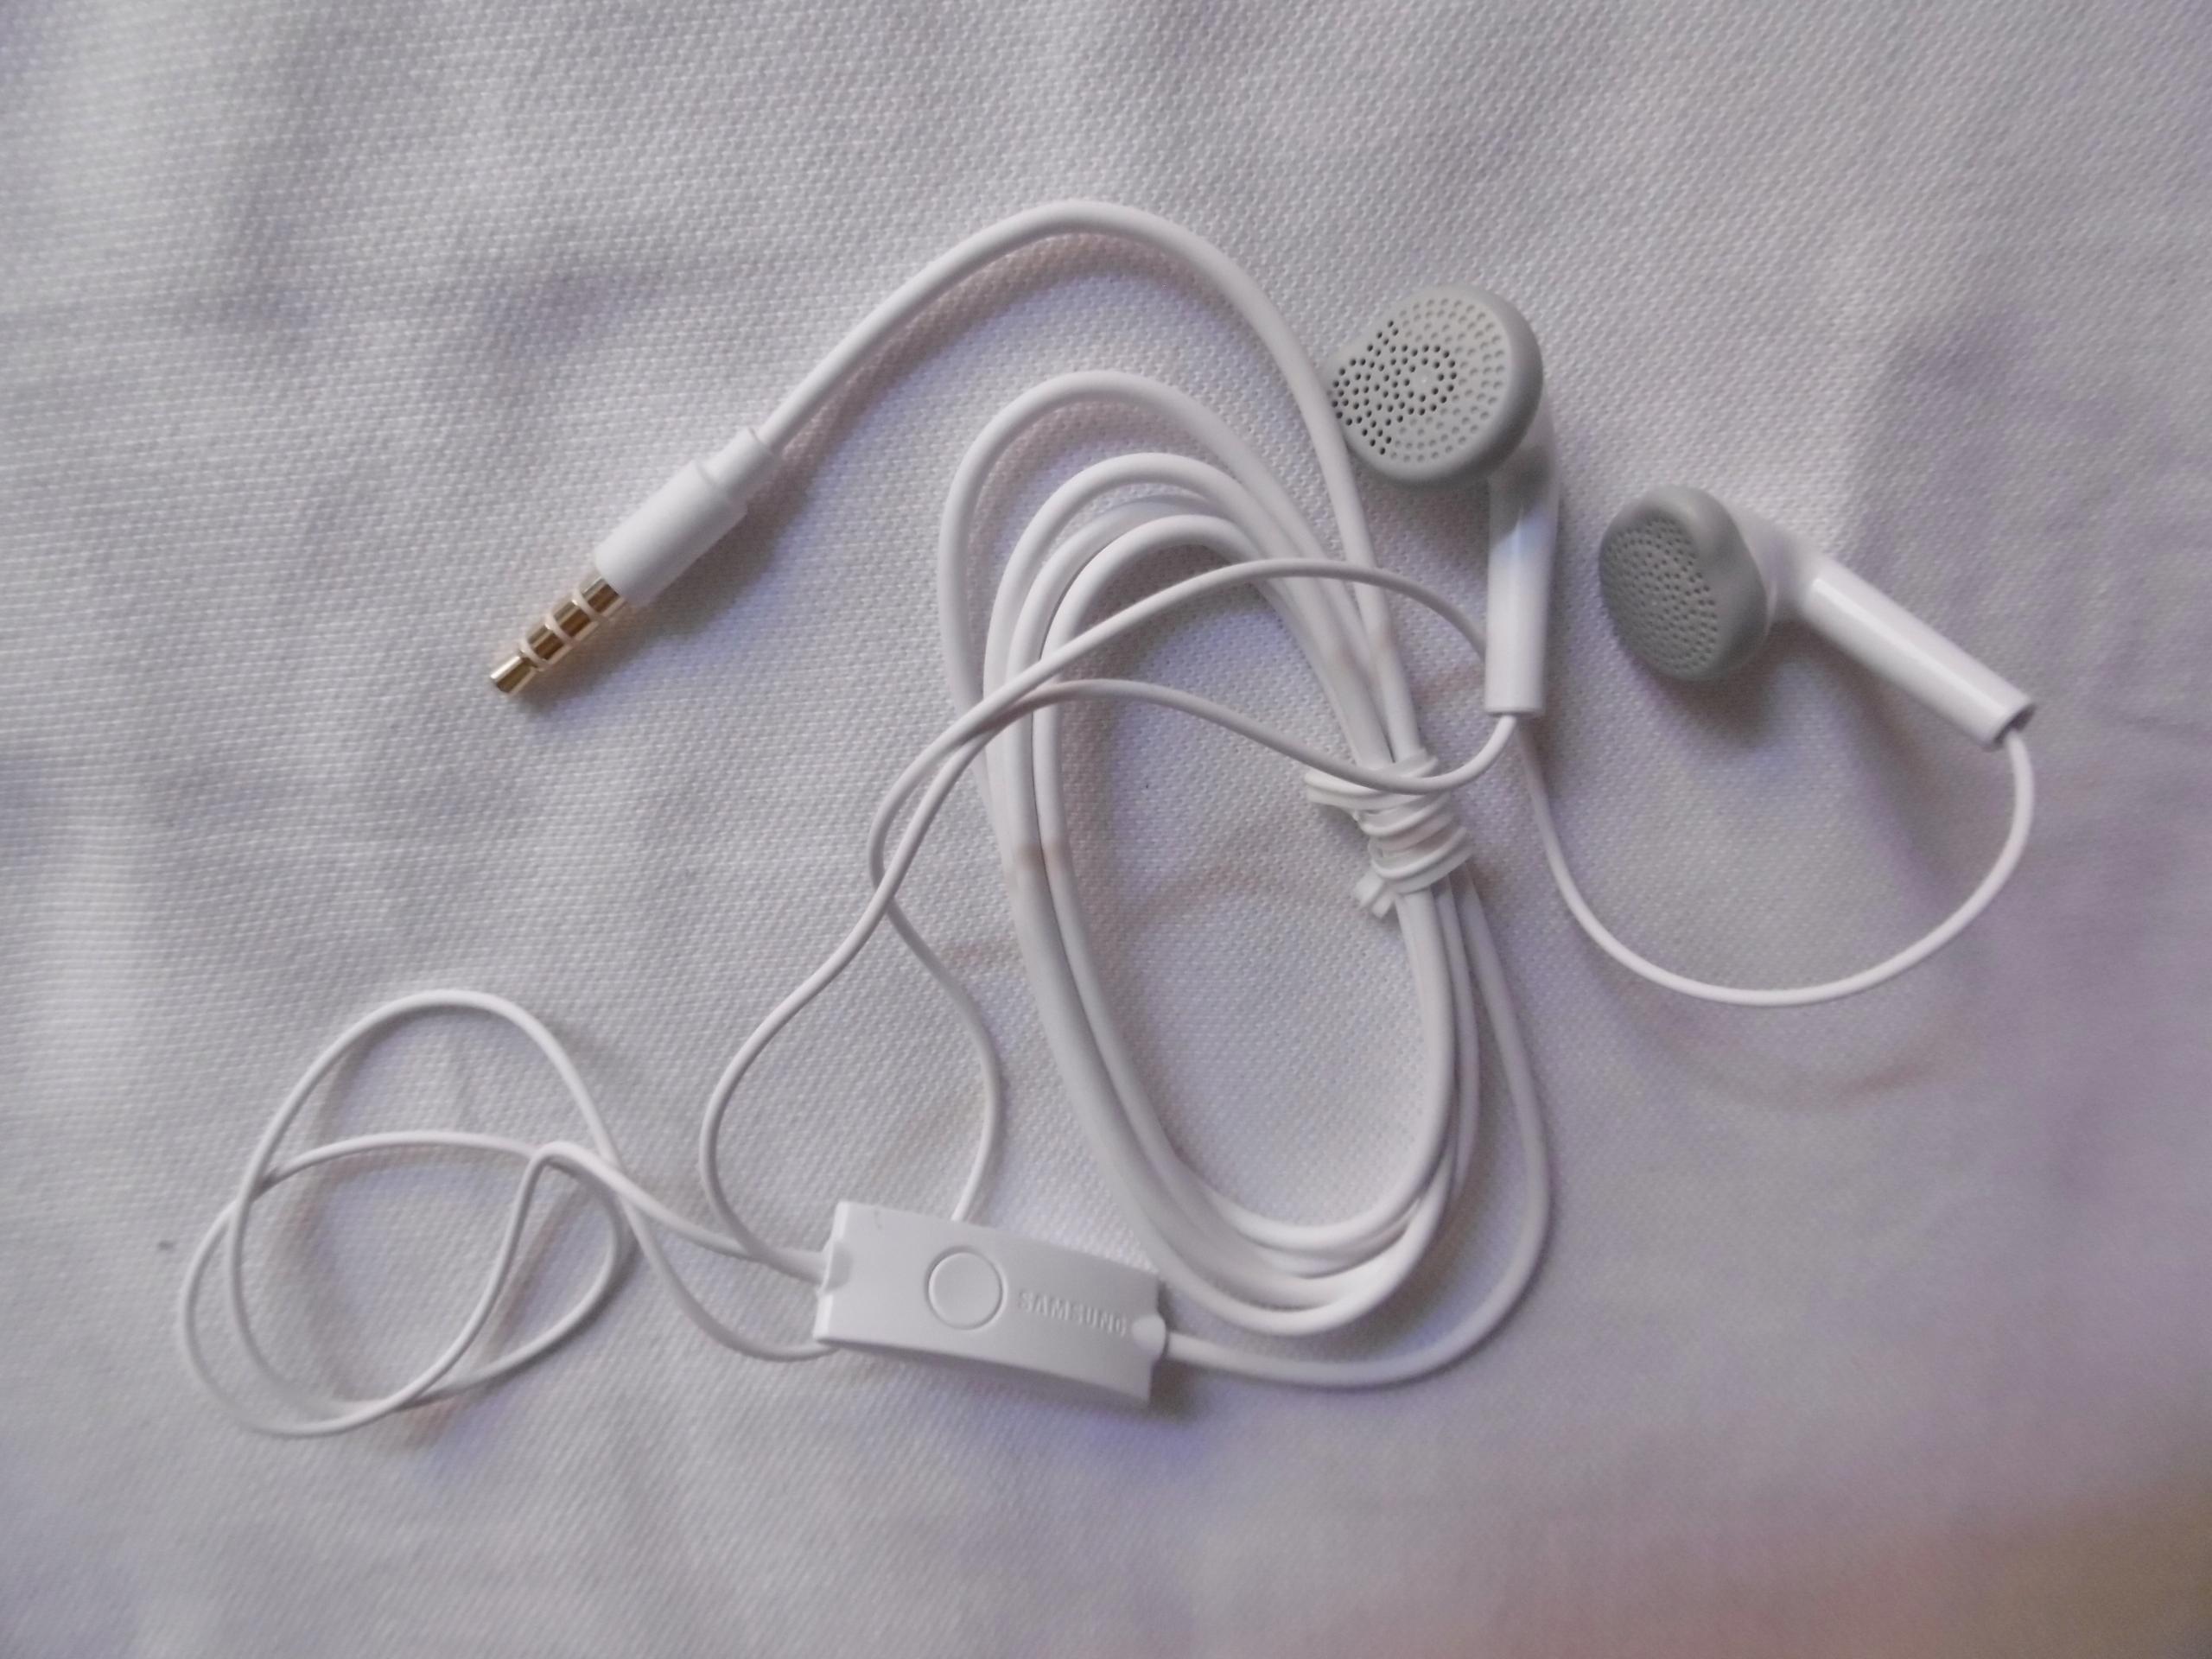 Słuchawki Samsung EHS61